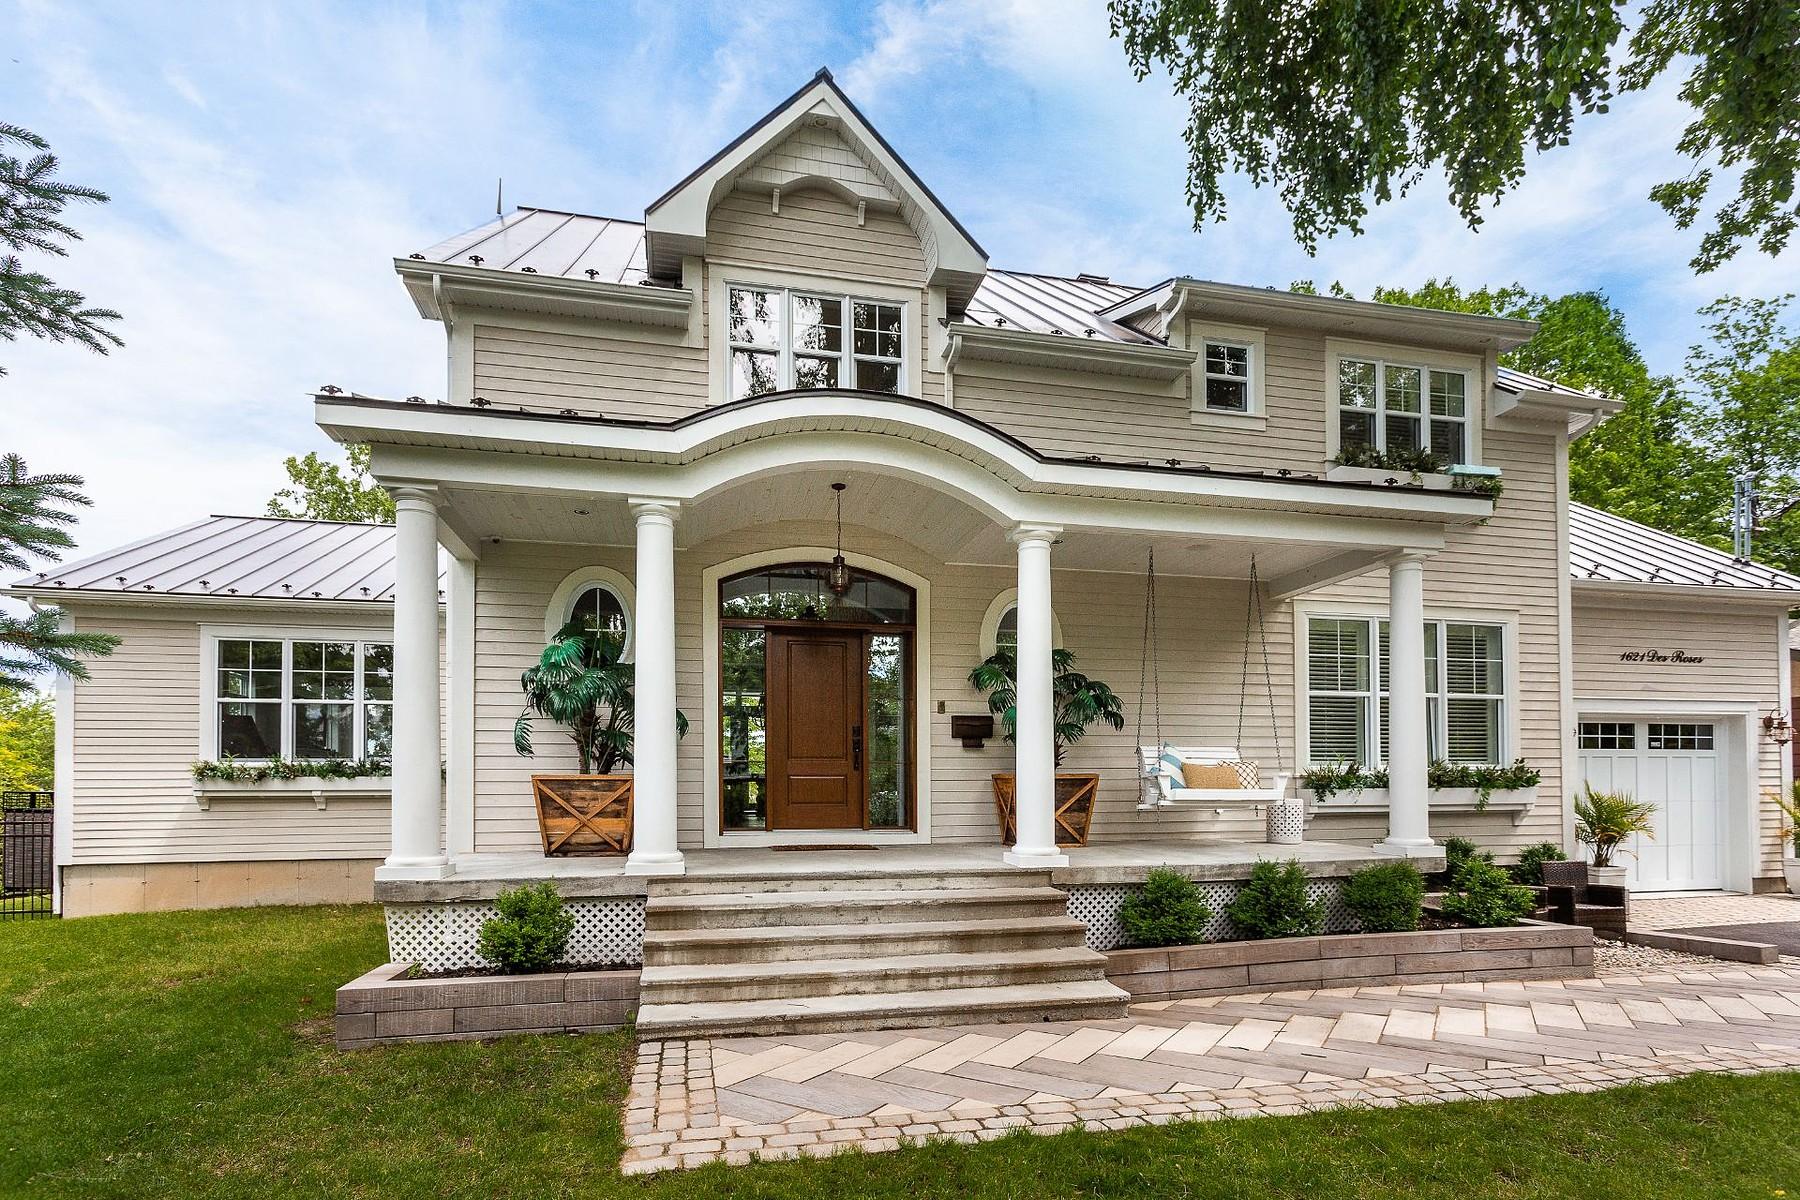 Single Family Homes for Sale at Carignan, Montérégie 1621 Rue des Roses Carignan, Quebec J3L5B8 Canada